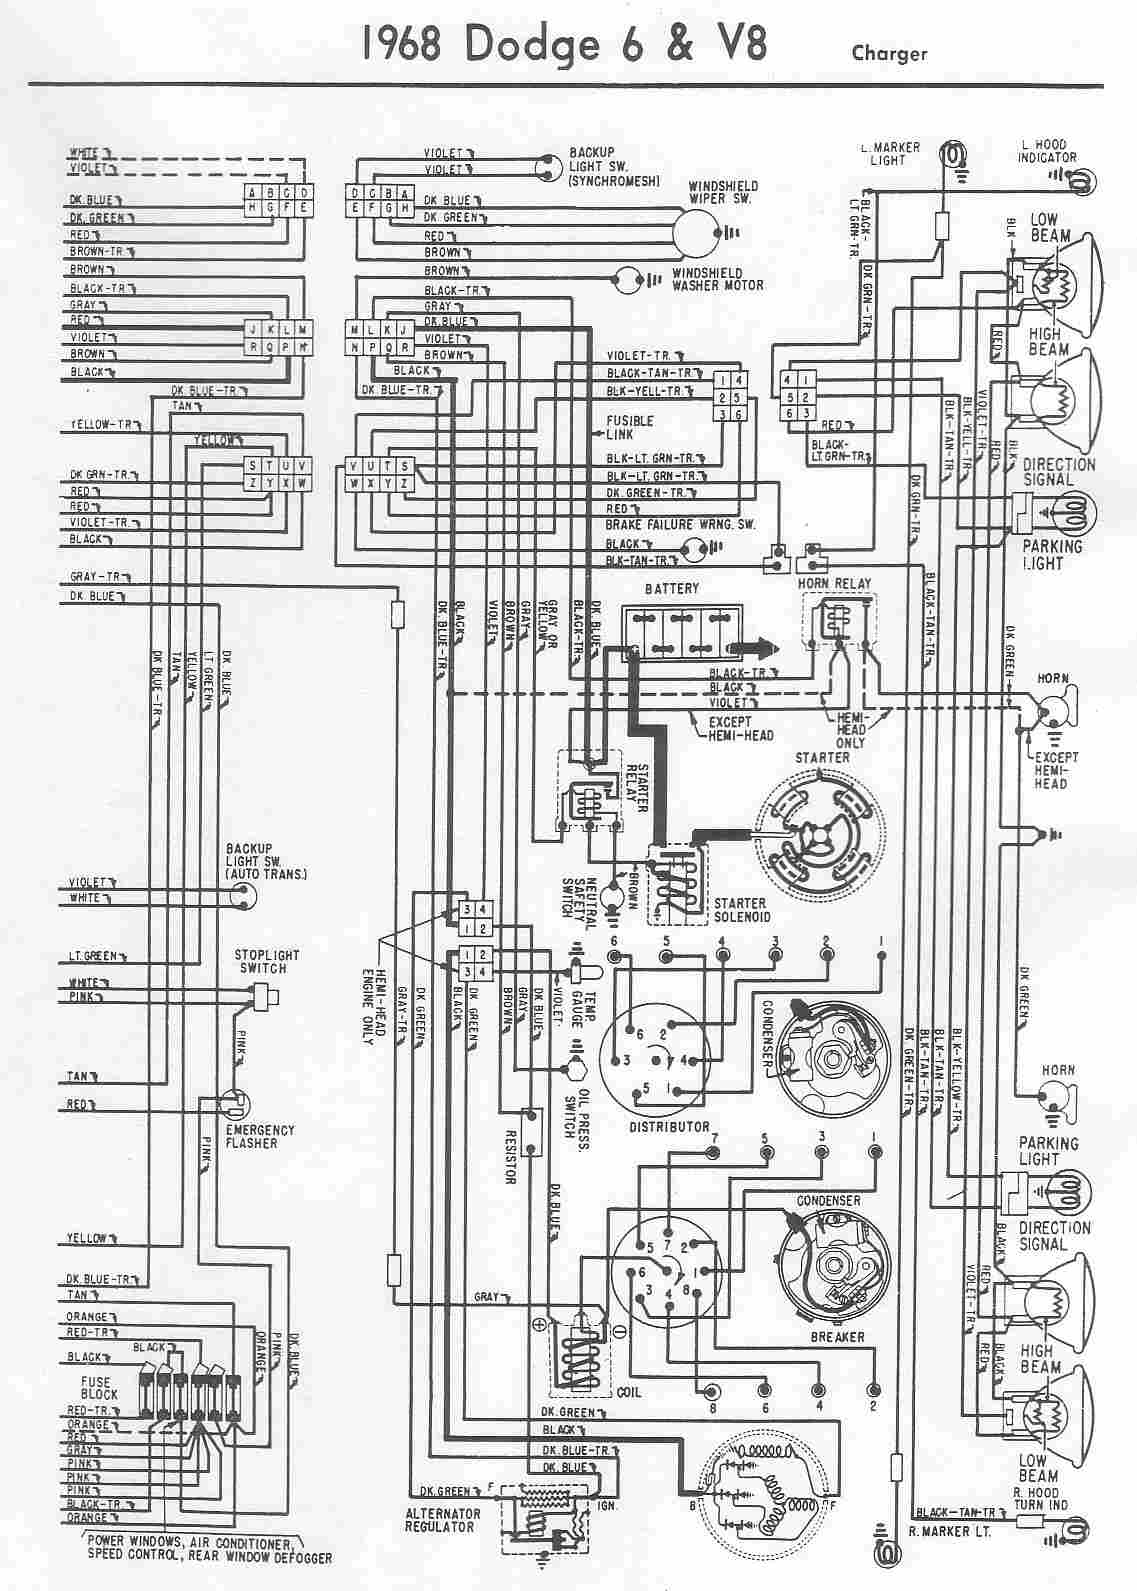 Wiring Diagram Dodge Car Manuals Wiring Diagrams Pdf Amp Fault Codes